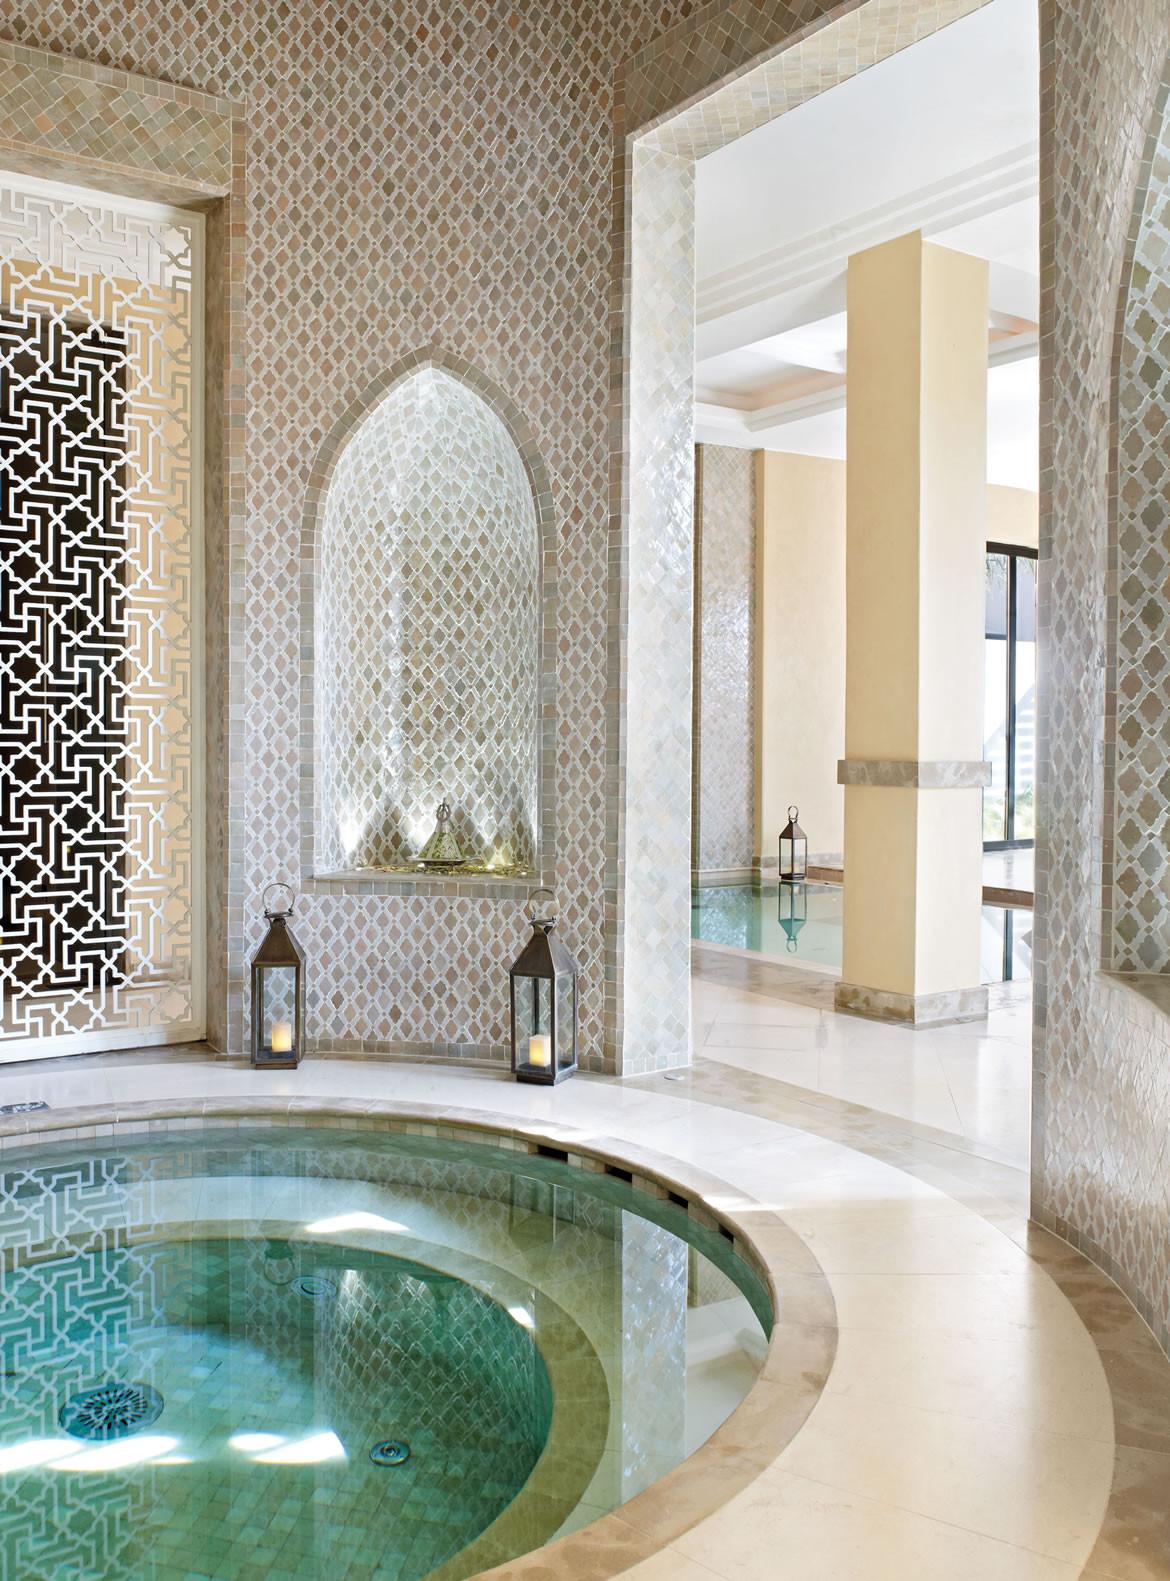 FS-Marrakech-Spa-Cold-Plunge-Pool-1170x1581.jpg